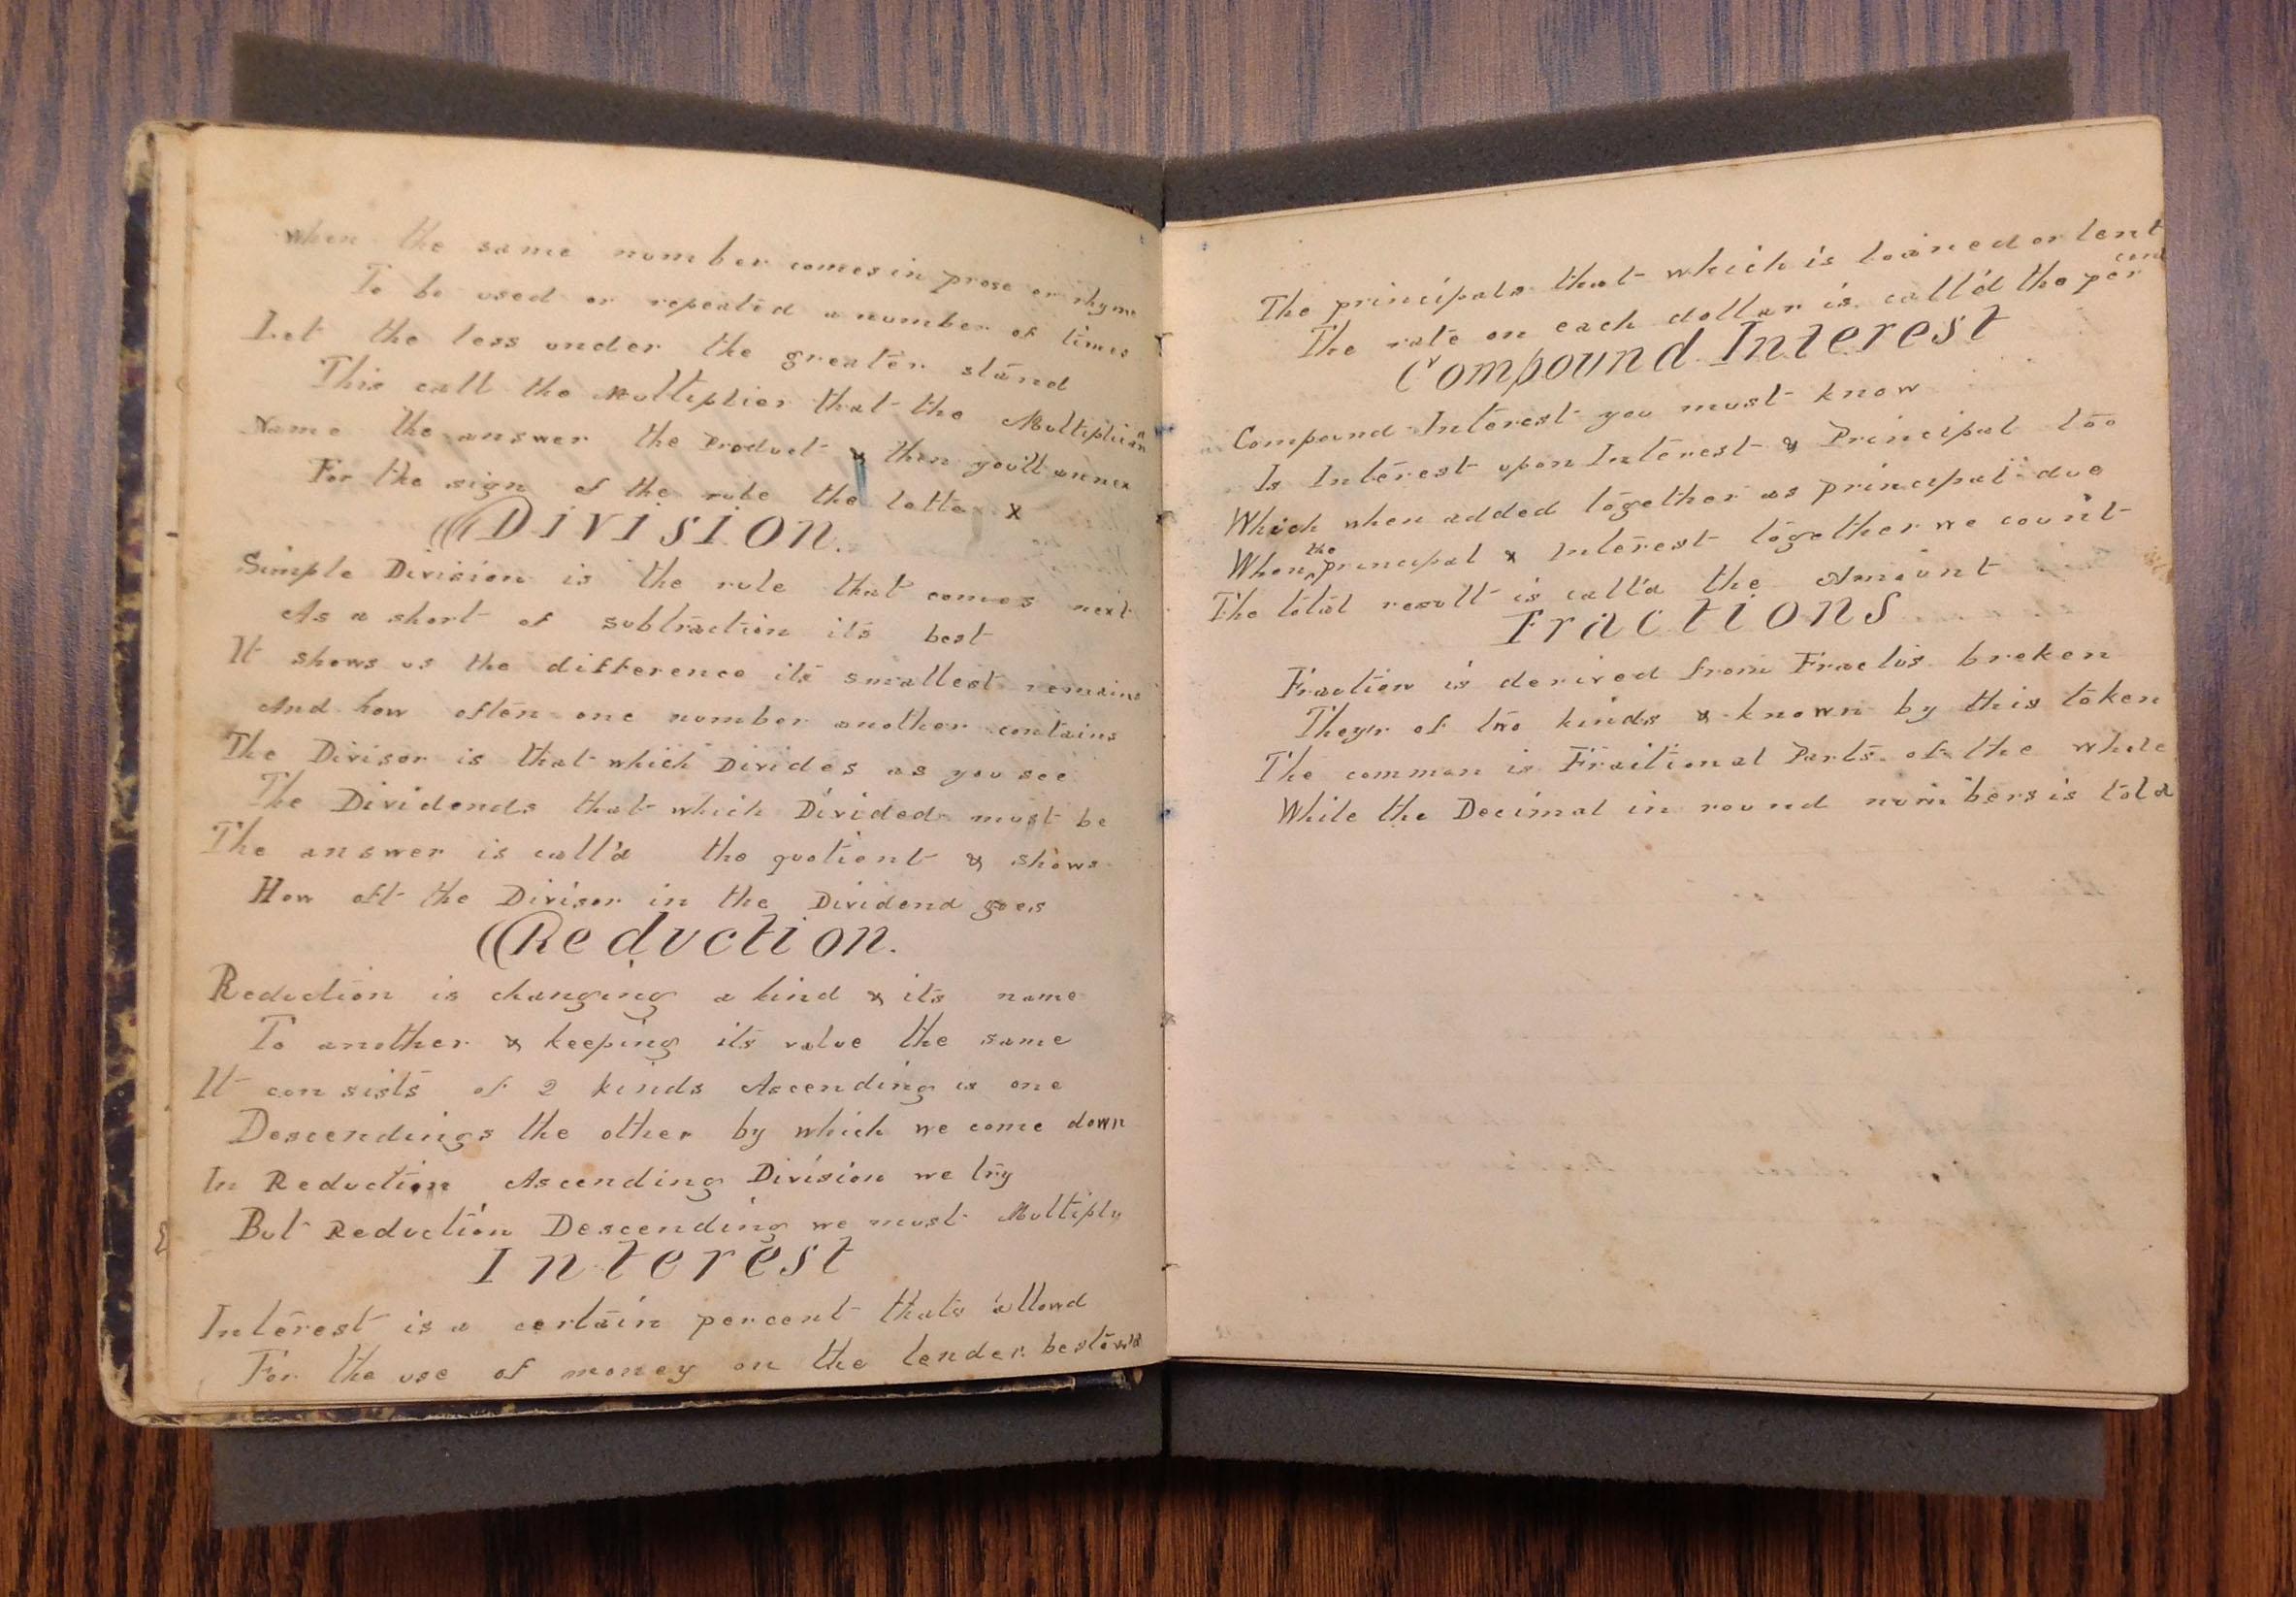 """Compound Interest,"" Teresa Dalbey School Notebook, 1859-1864"